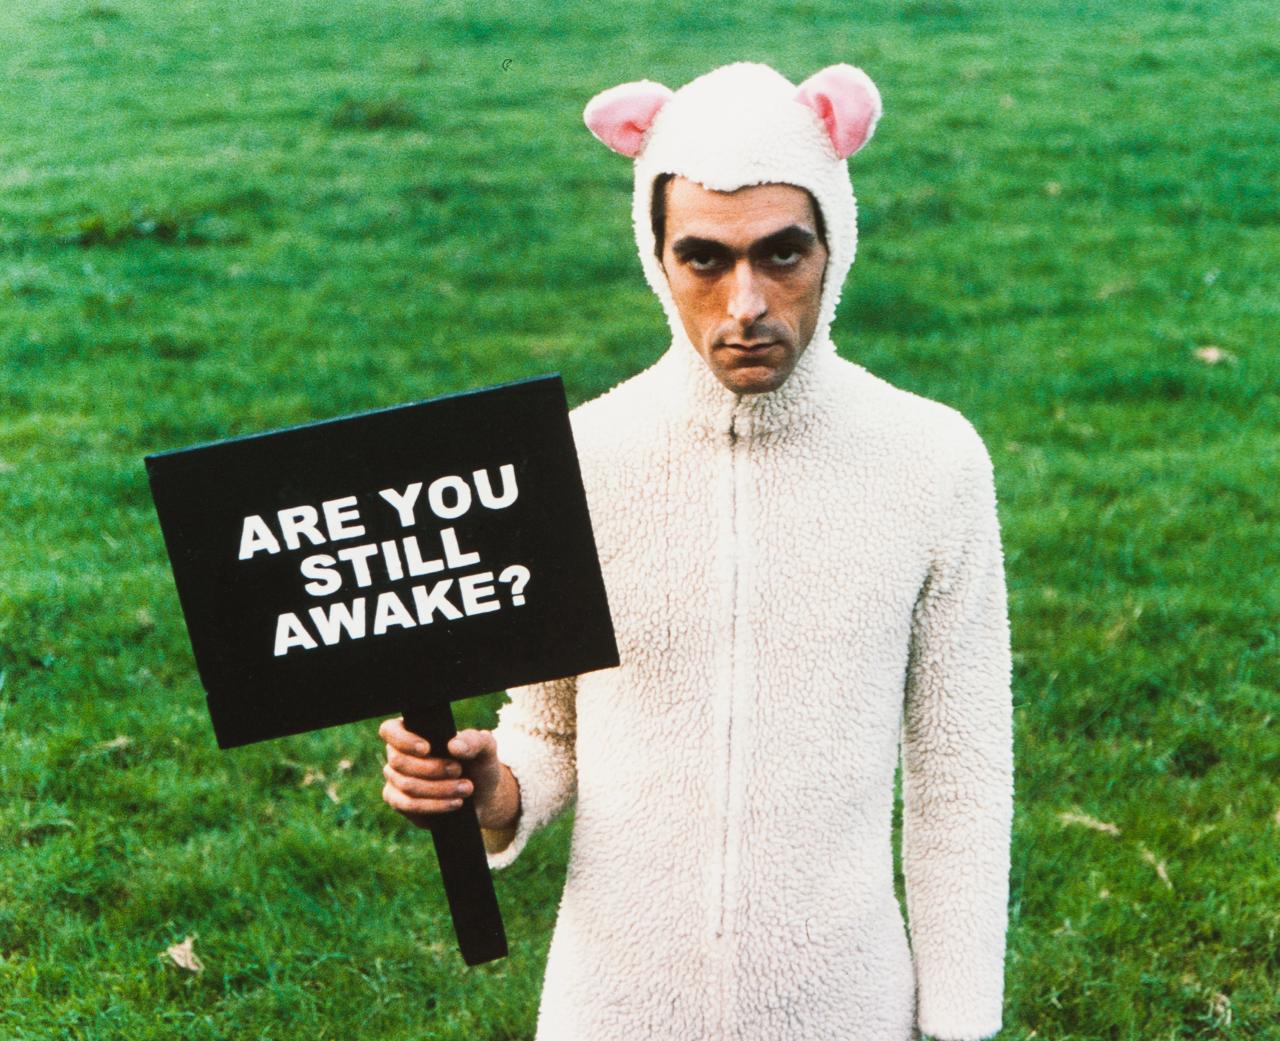 Joao Pedro Vale-Are you still awake?-2002